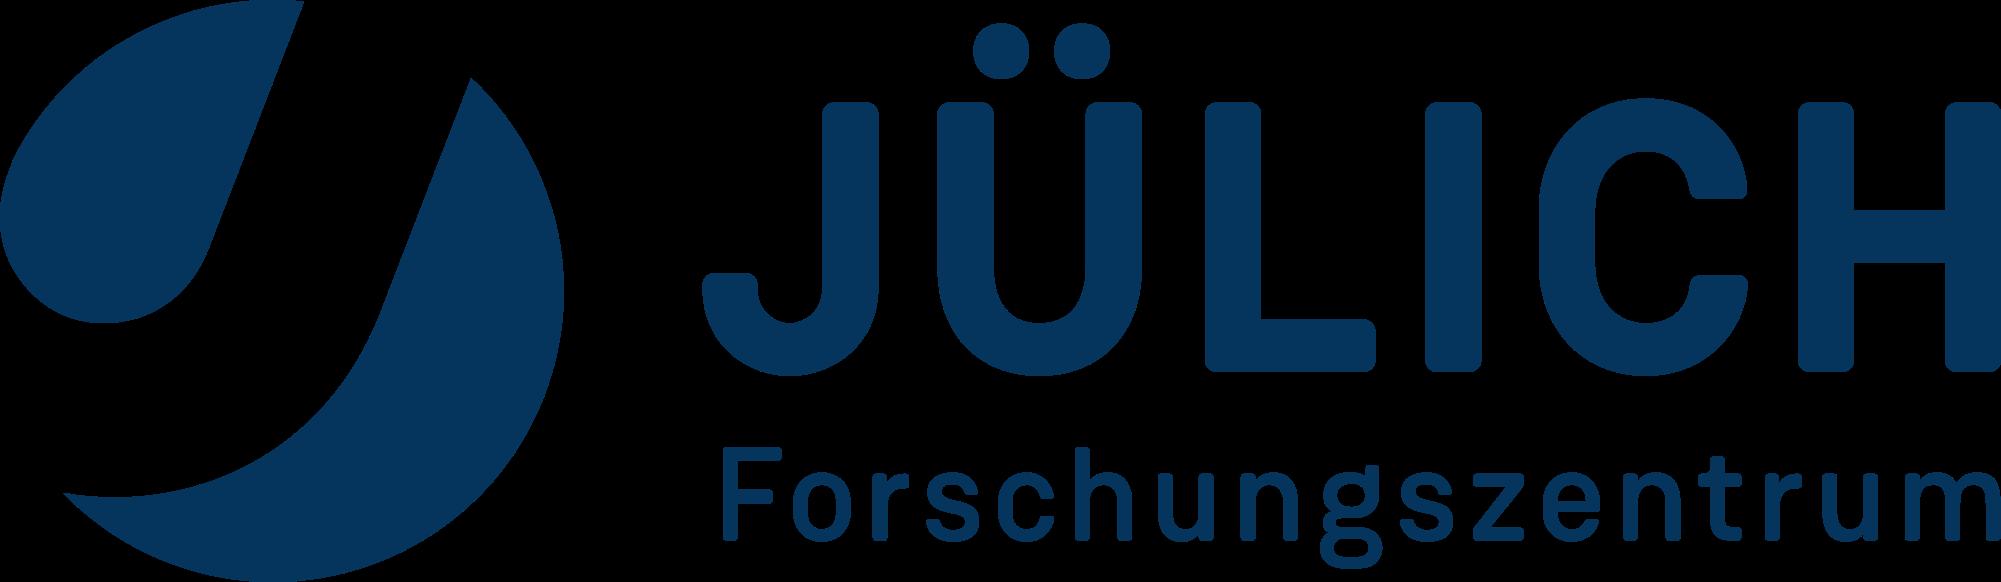 Forschungszentrum Juelich logo